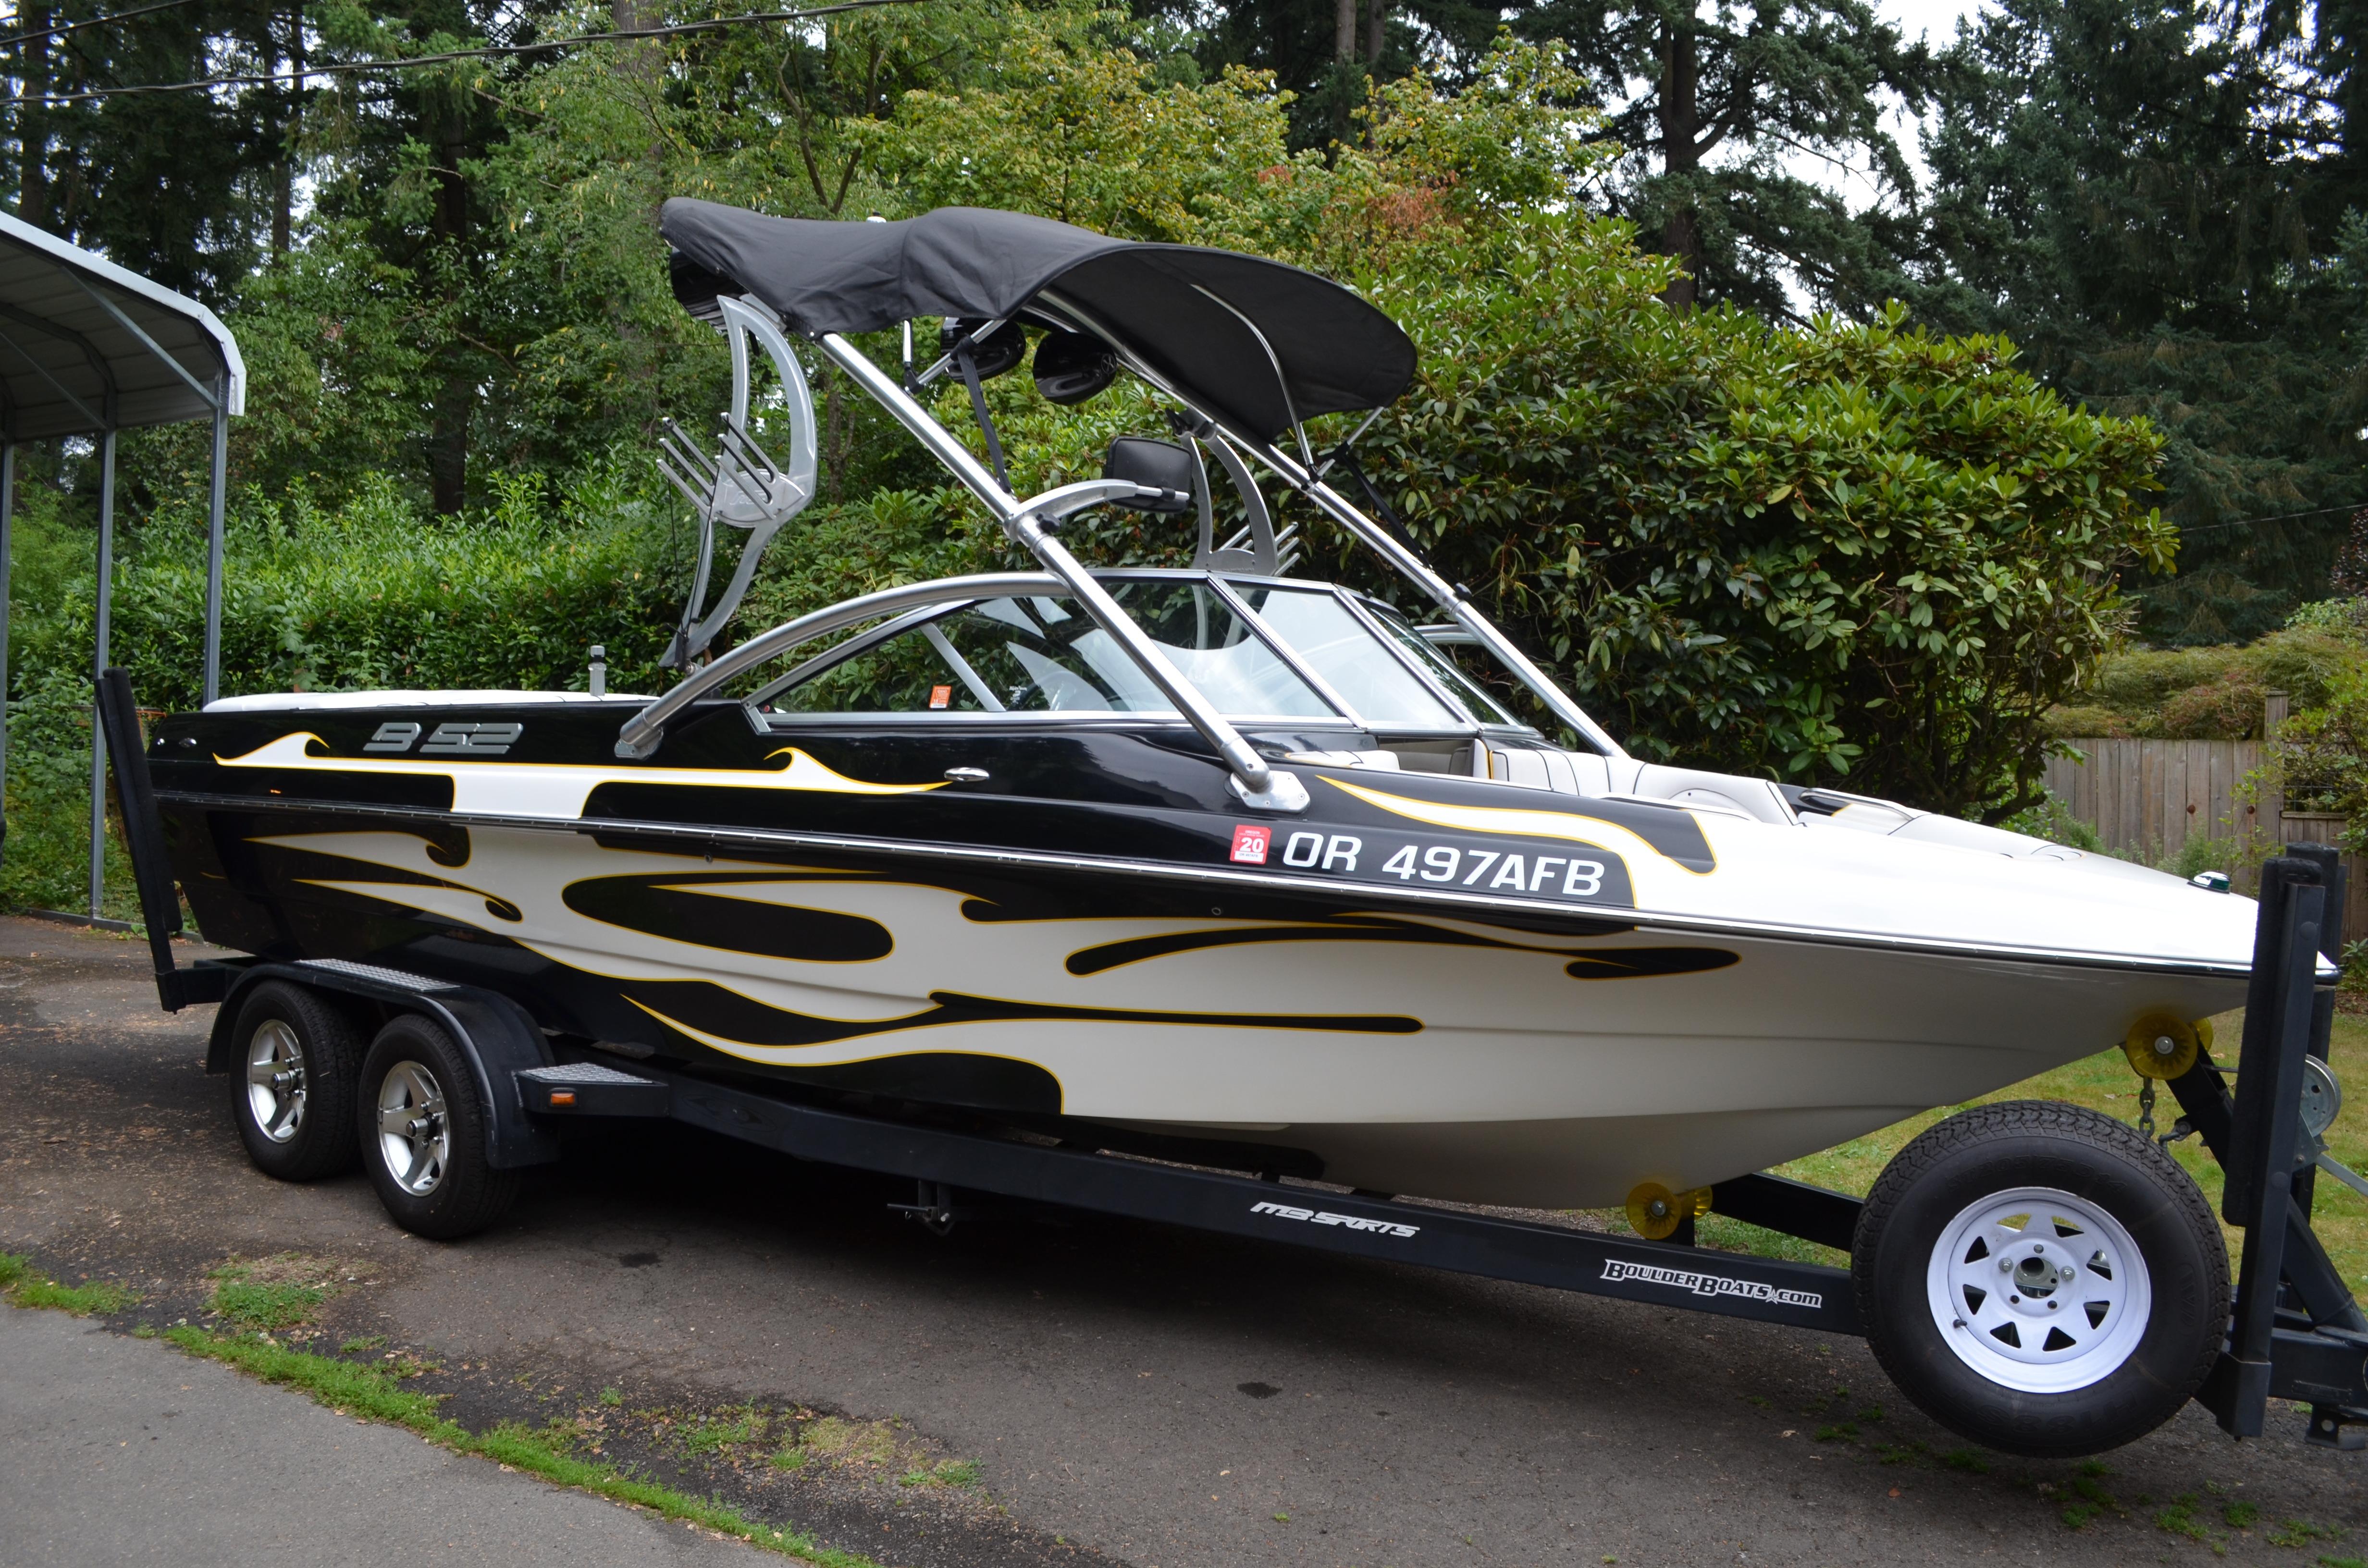 MB B52 V23 Wakeboard Boat